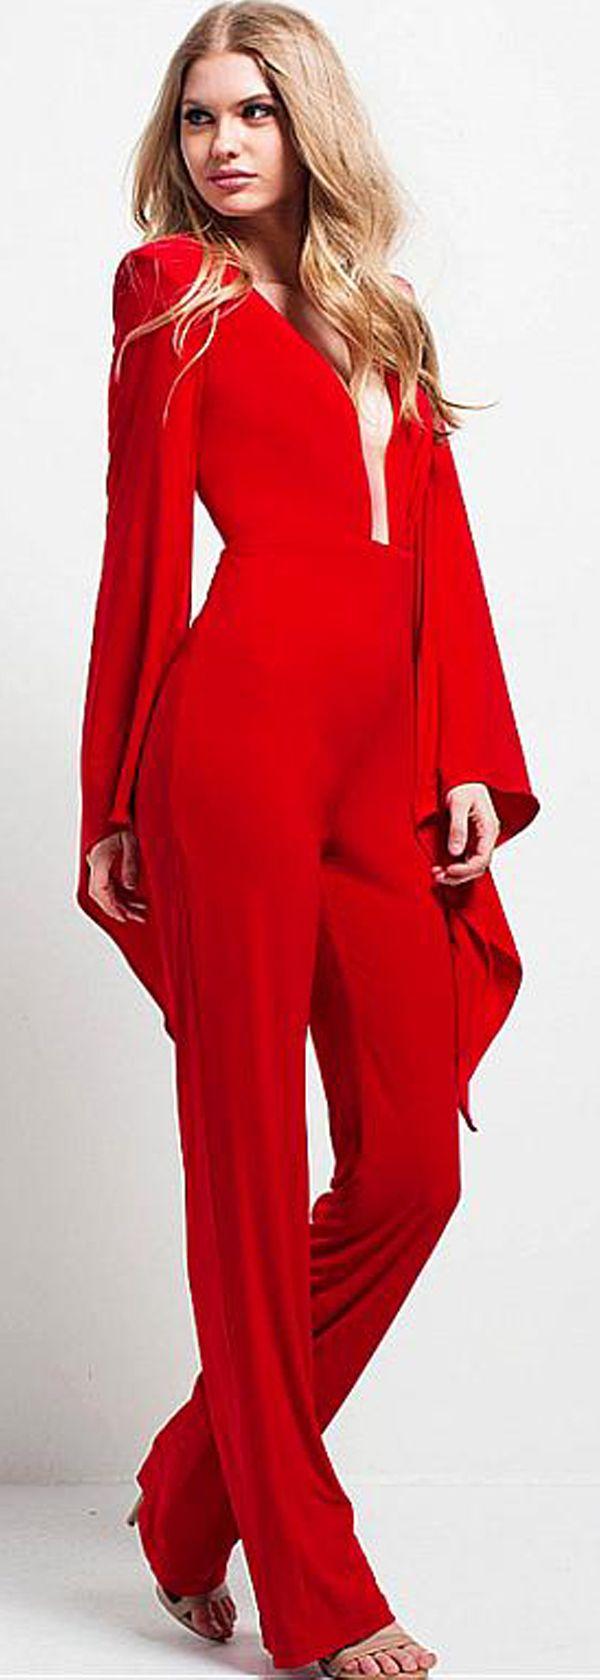 Wonderful jumpsuit spandex vneck neckline prom dresses pra vistir